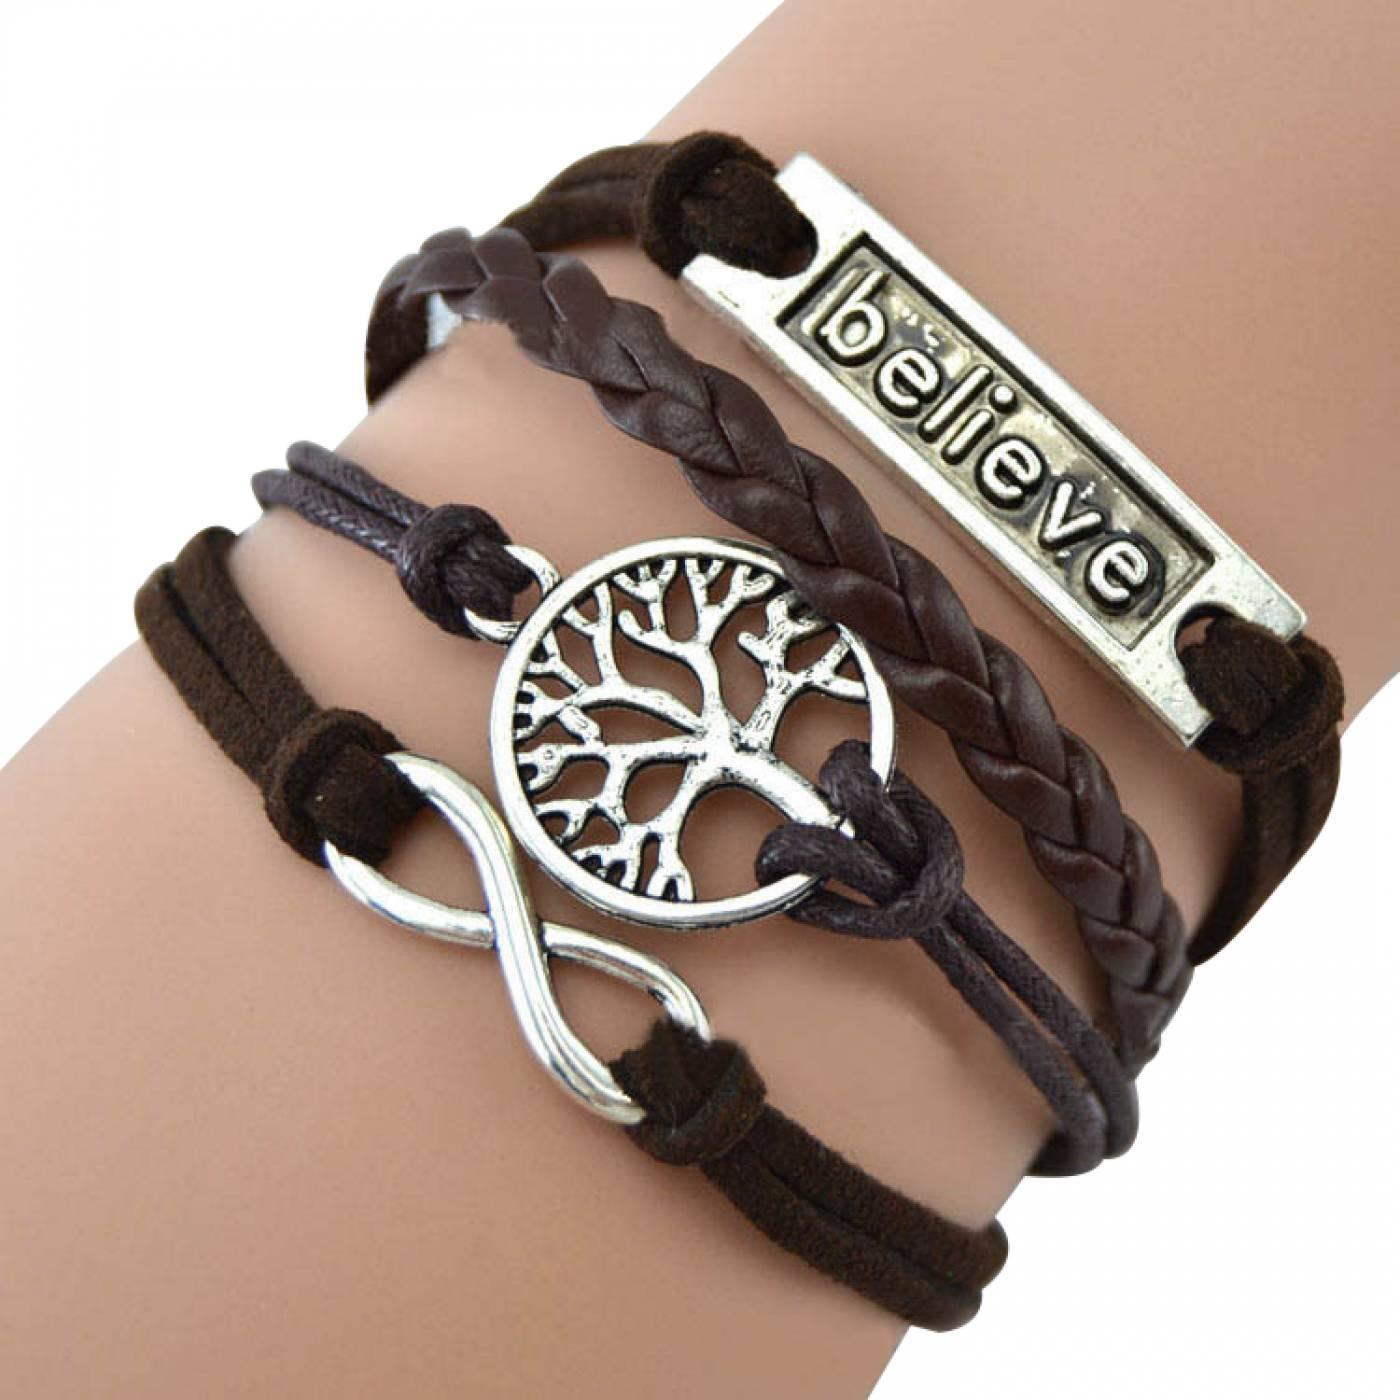 bracelet br silien infini femme infini noir simili cuir noir. Black Bedroom Furniture Sets. Home Design Ideas